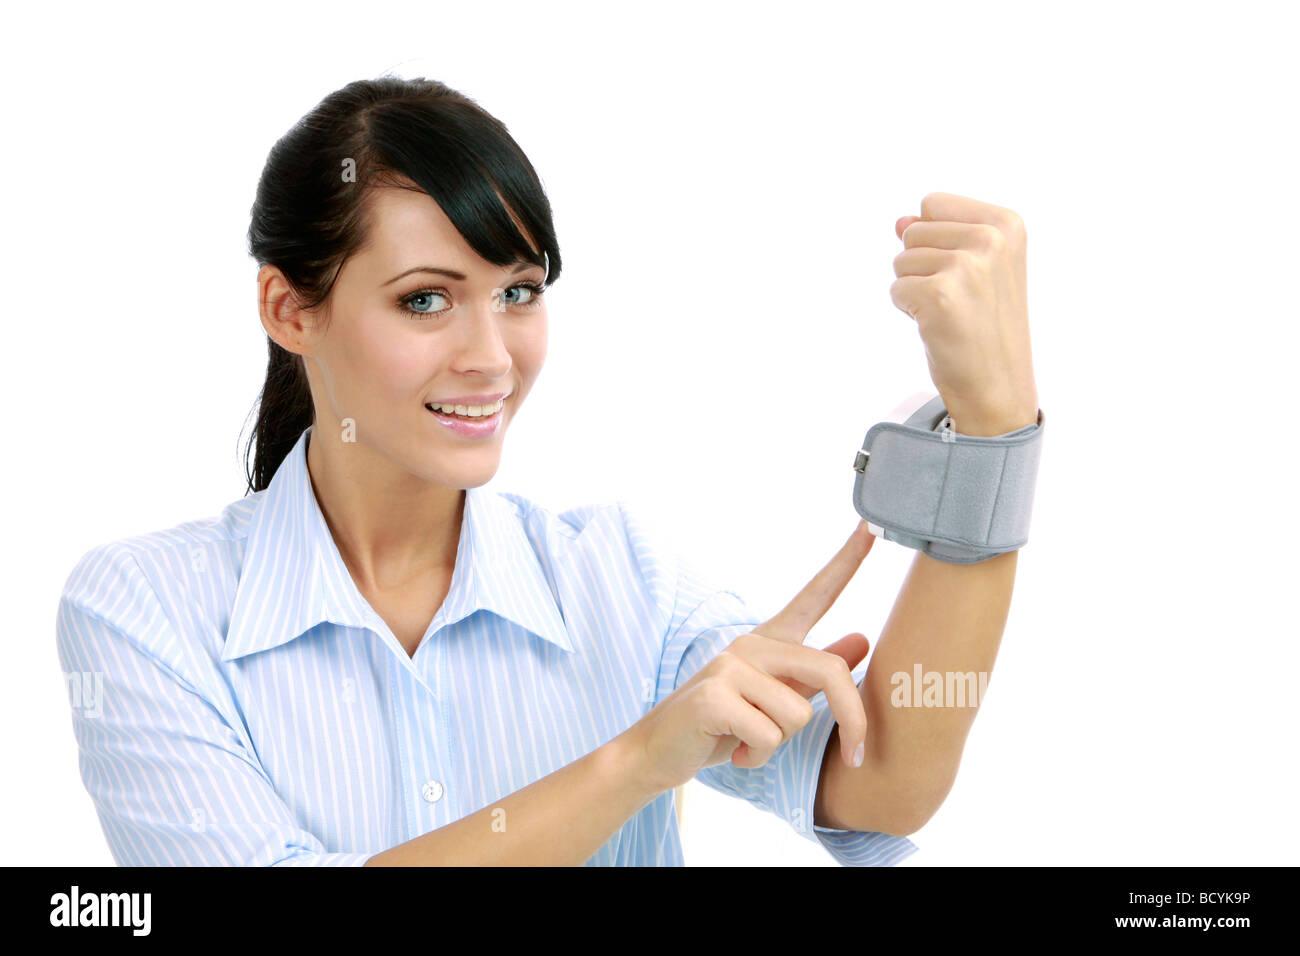 Frau misst ihren Blutdruck woman measures her blood pressure - Stock Image